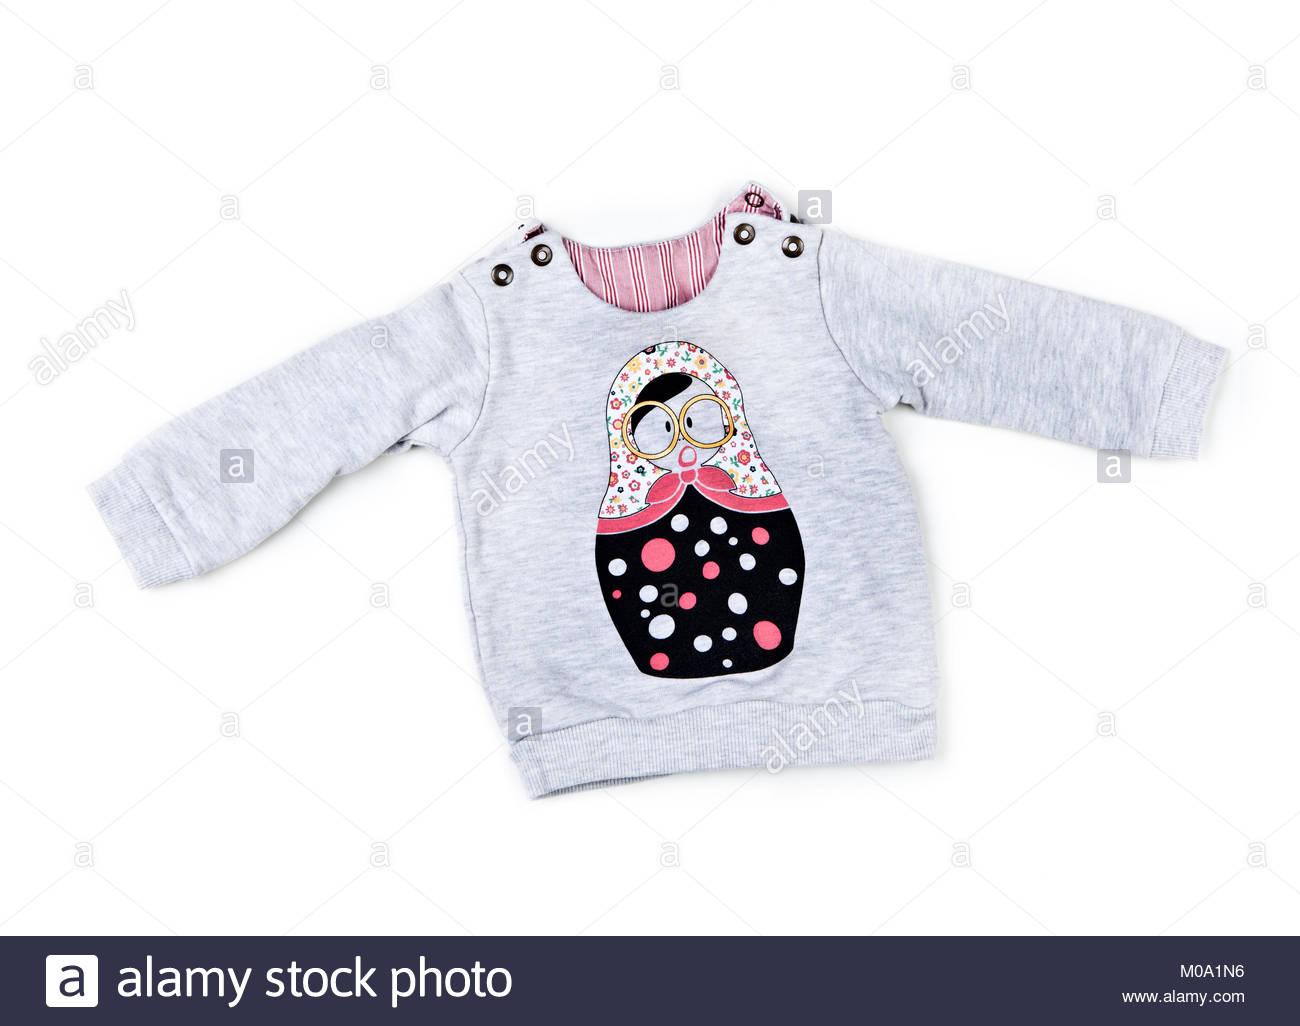 Baby Girls Warm Clothes studio quality white background - Stock Image